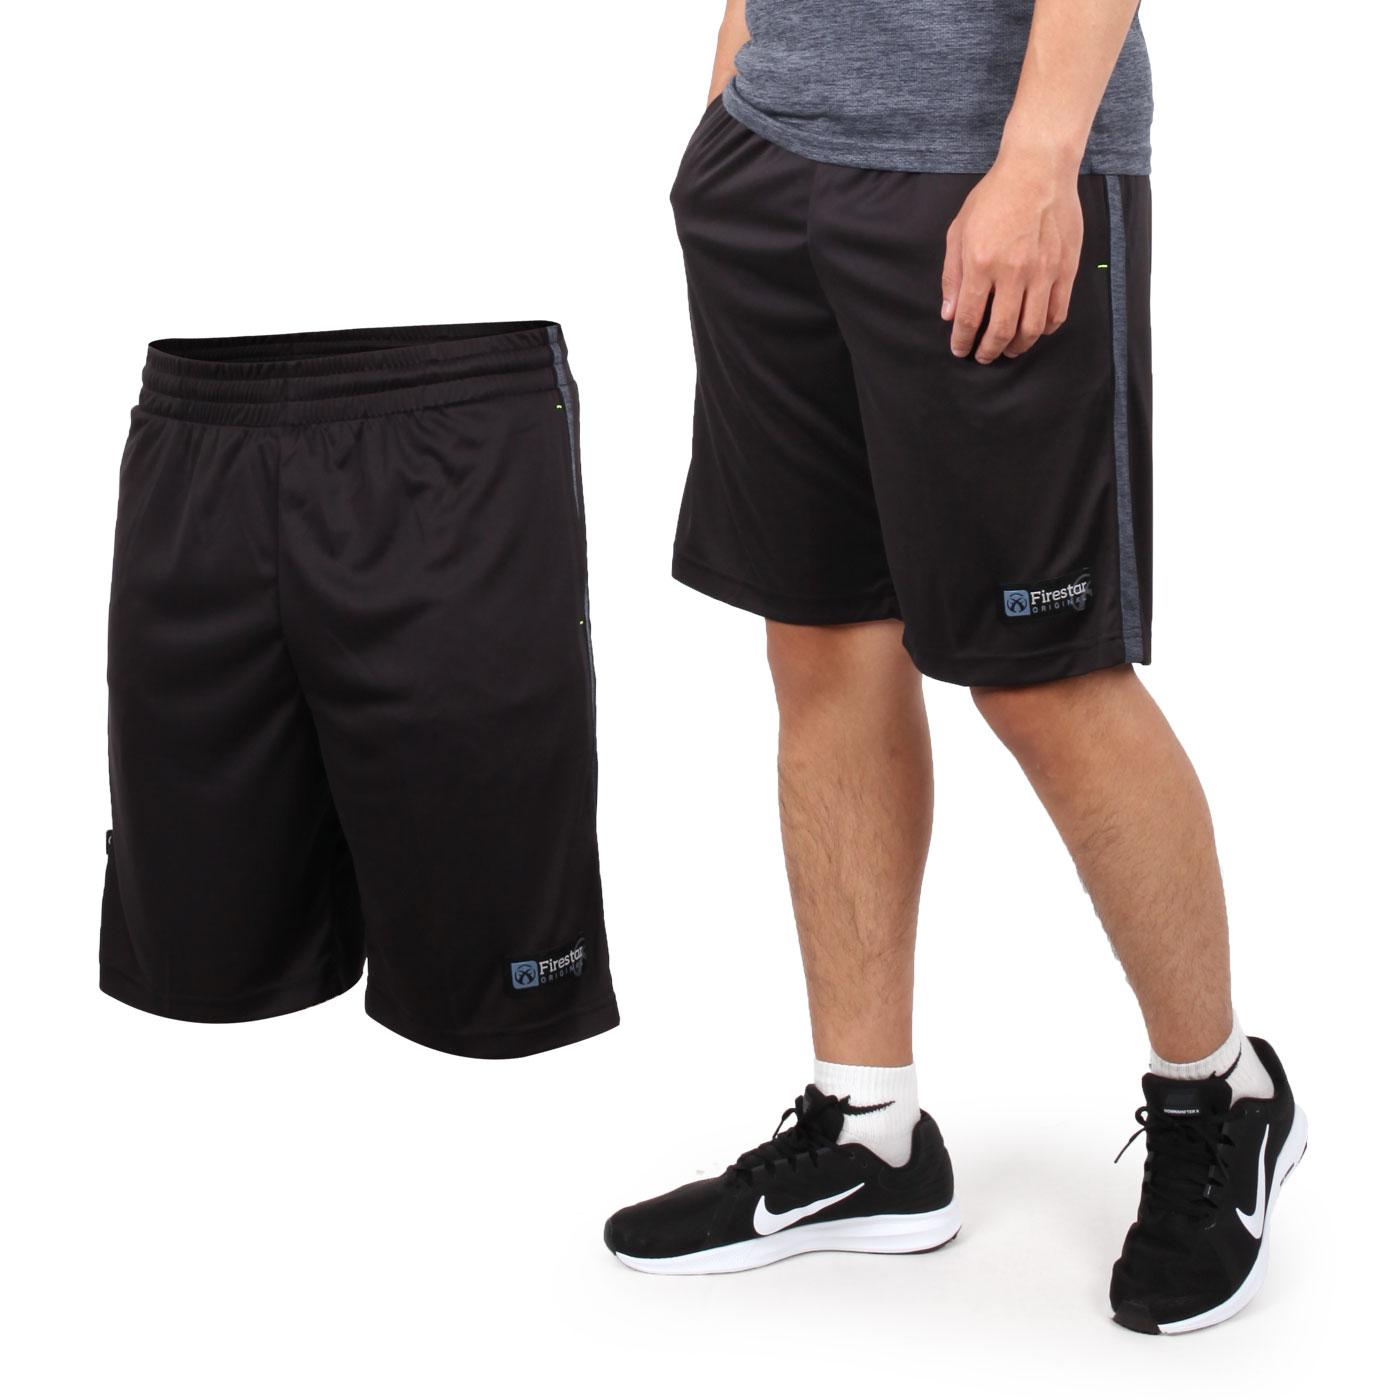 FIRESTAR 男款吸排籃球褲 B8002-18 - 黑麻灰